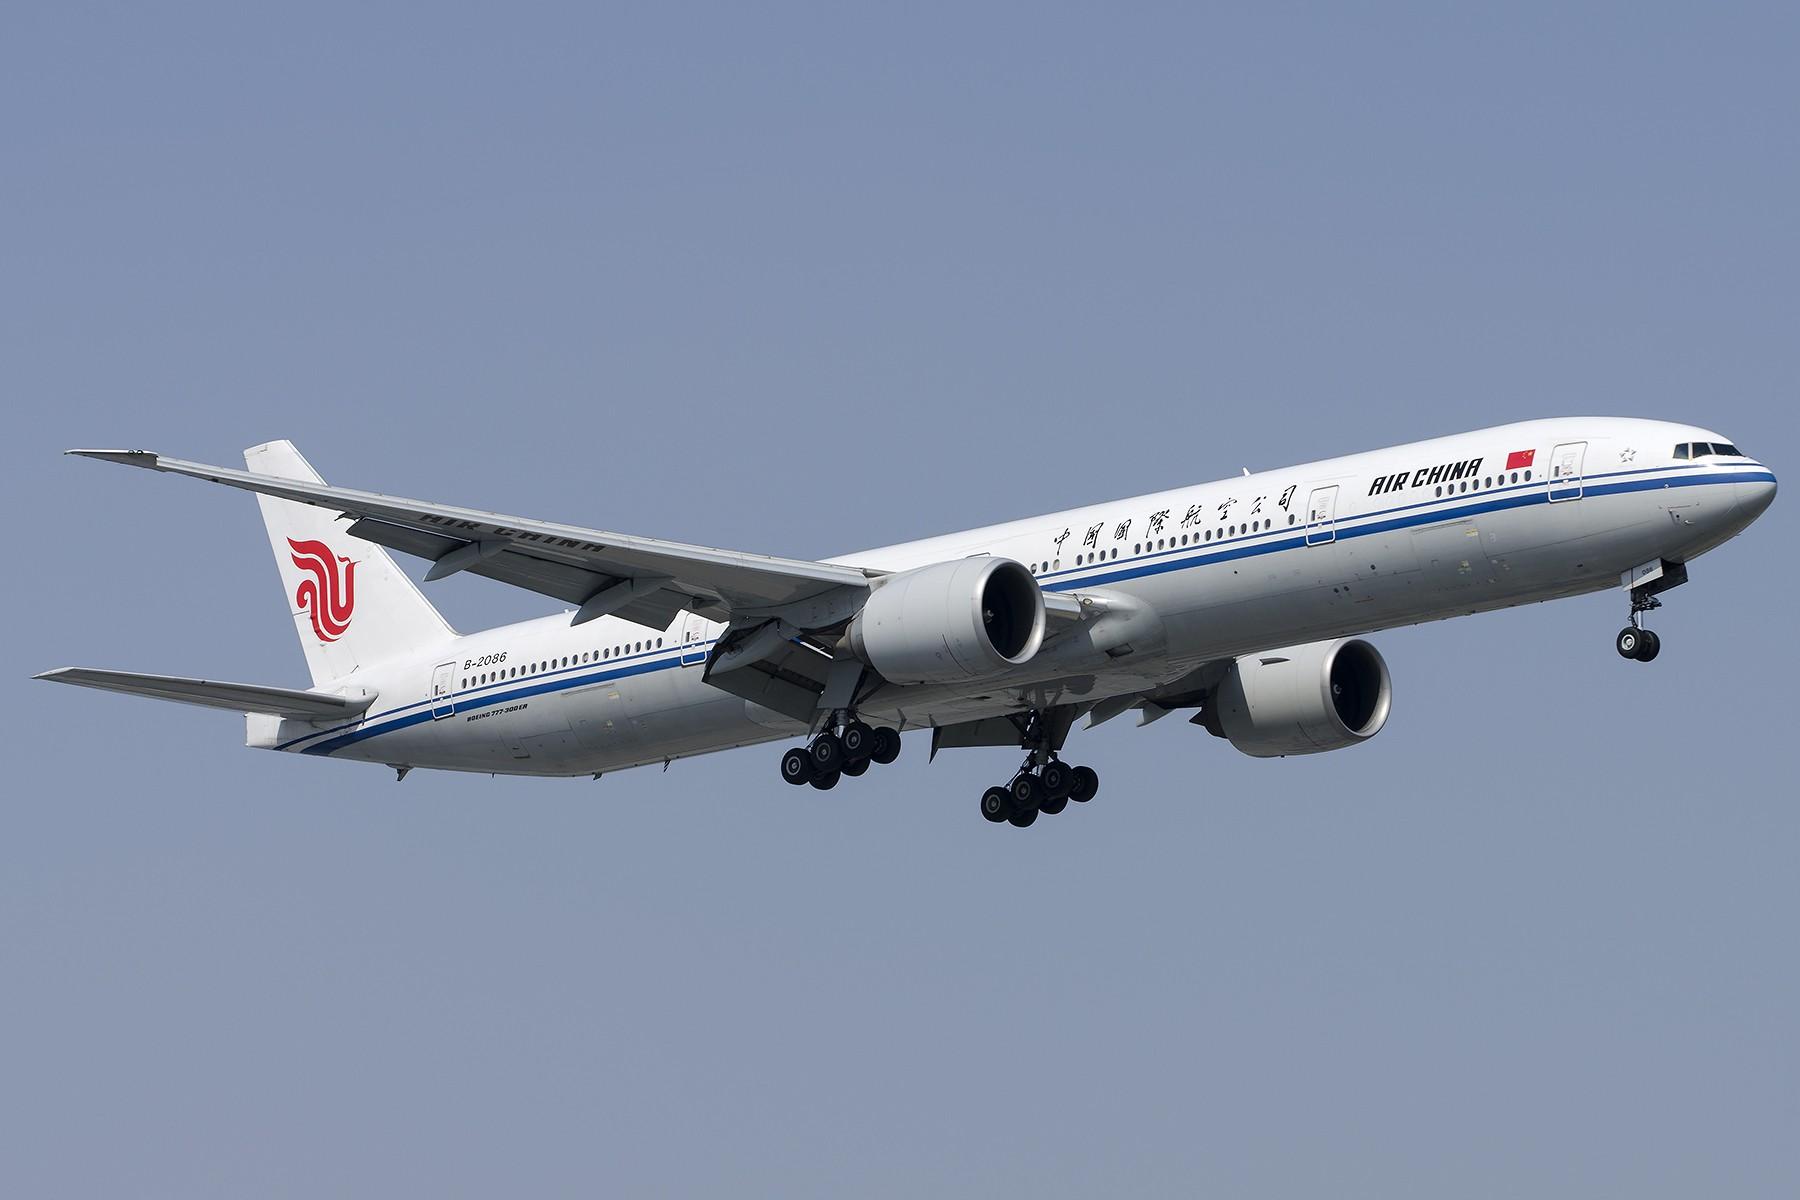 Re:[原创][原创]【SHA拍机*1800大图】4月拍的了,记得那天好货还挺多 BOEING 777-300ER B-2086 中国上海虹桥国际机场